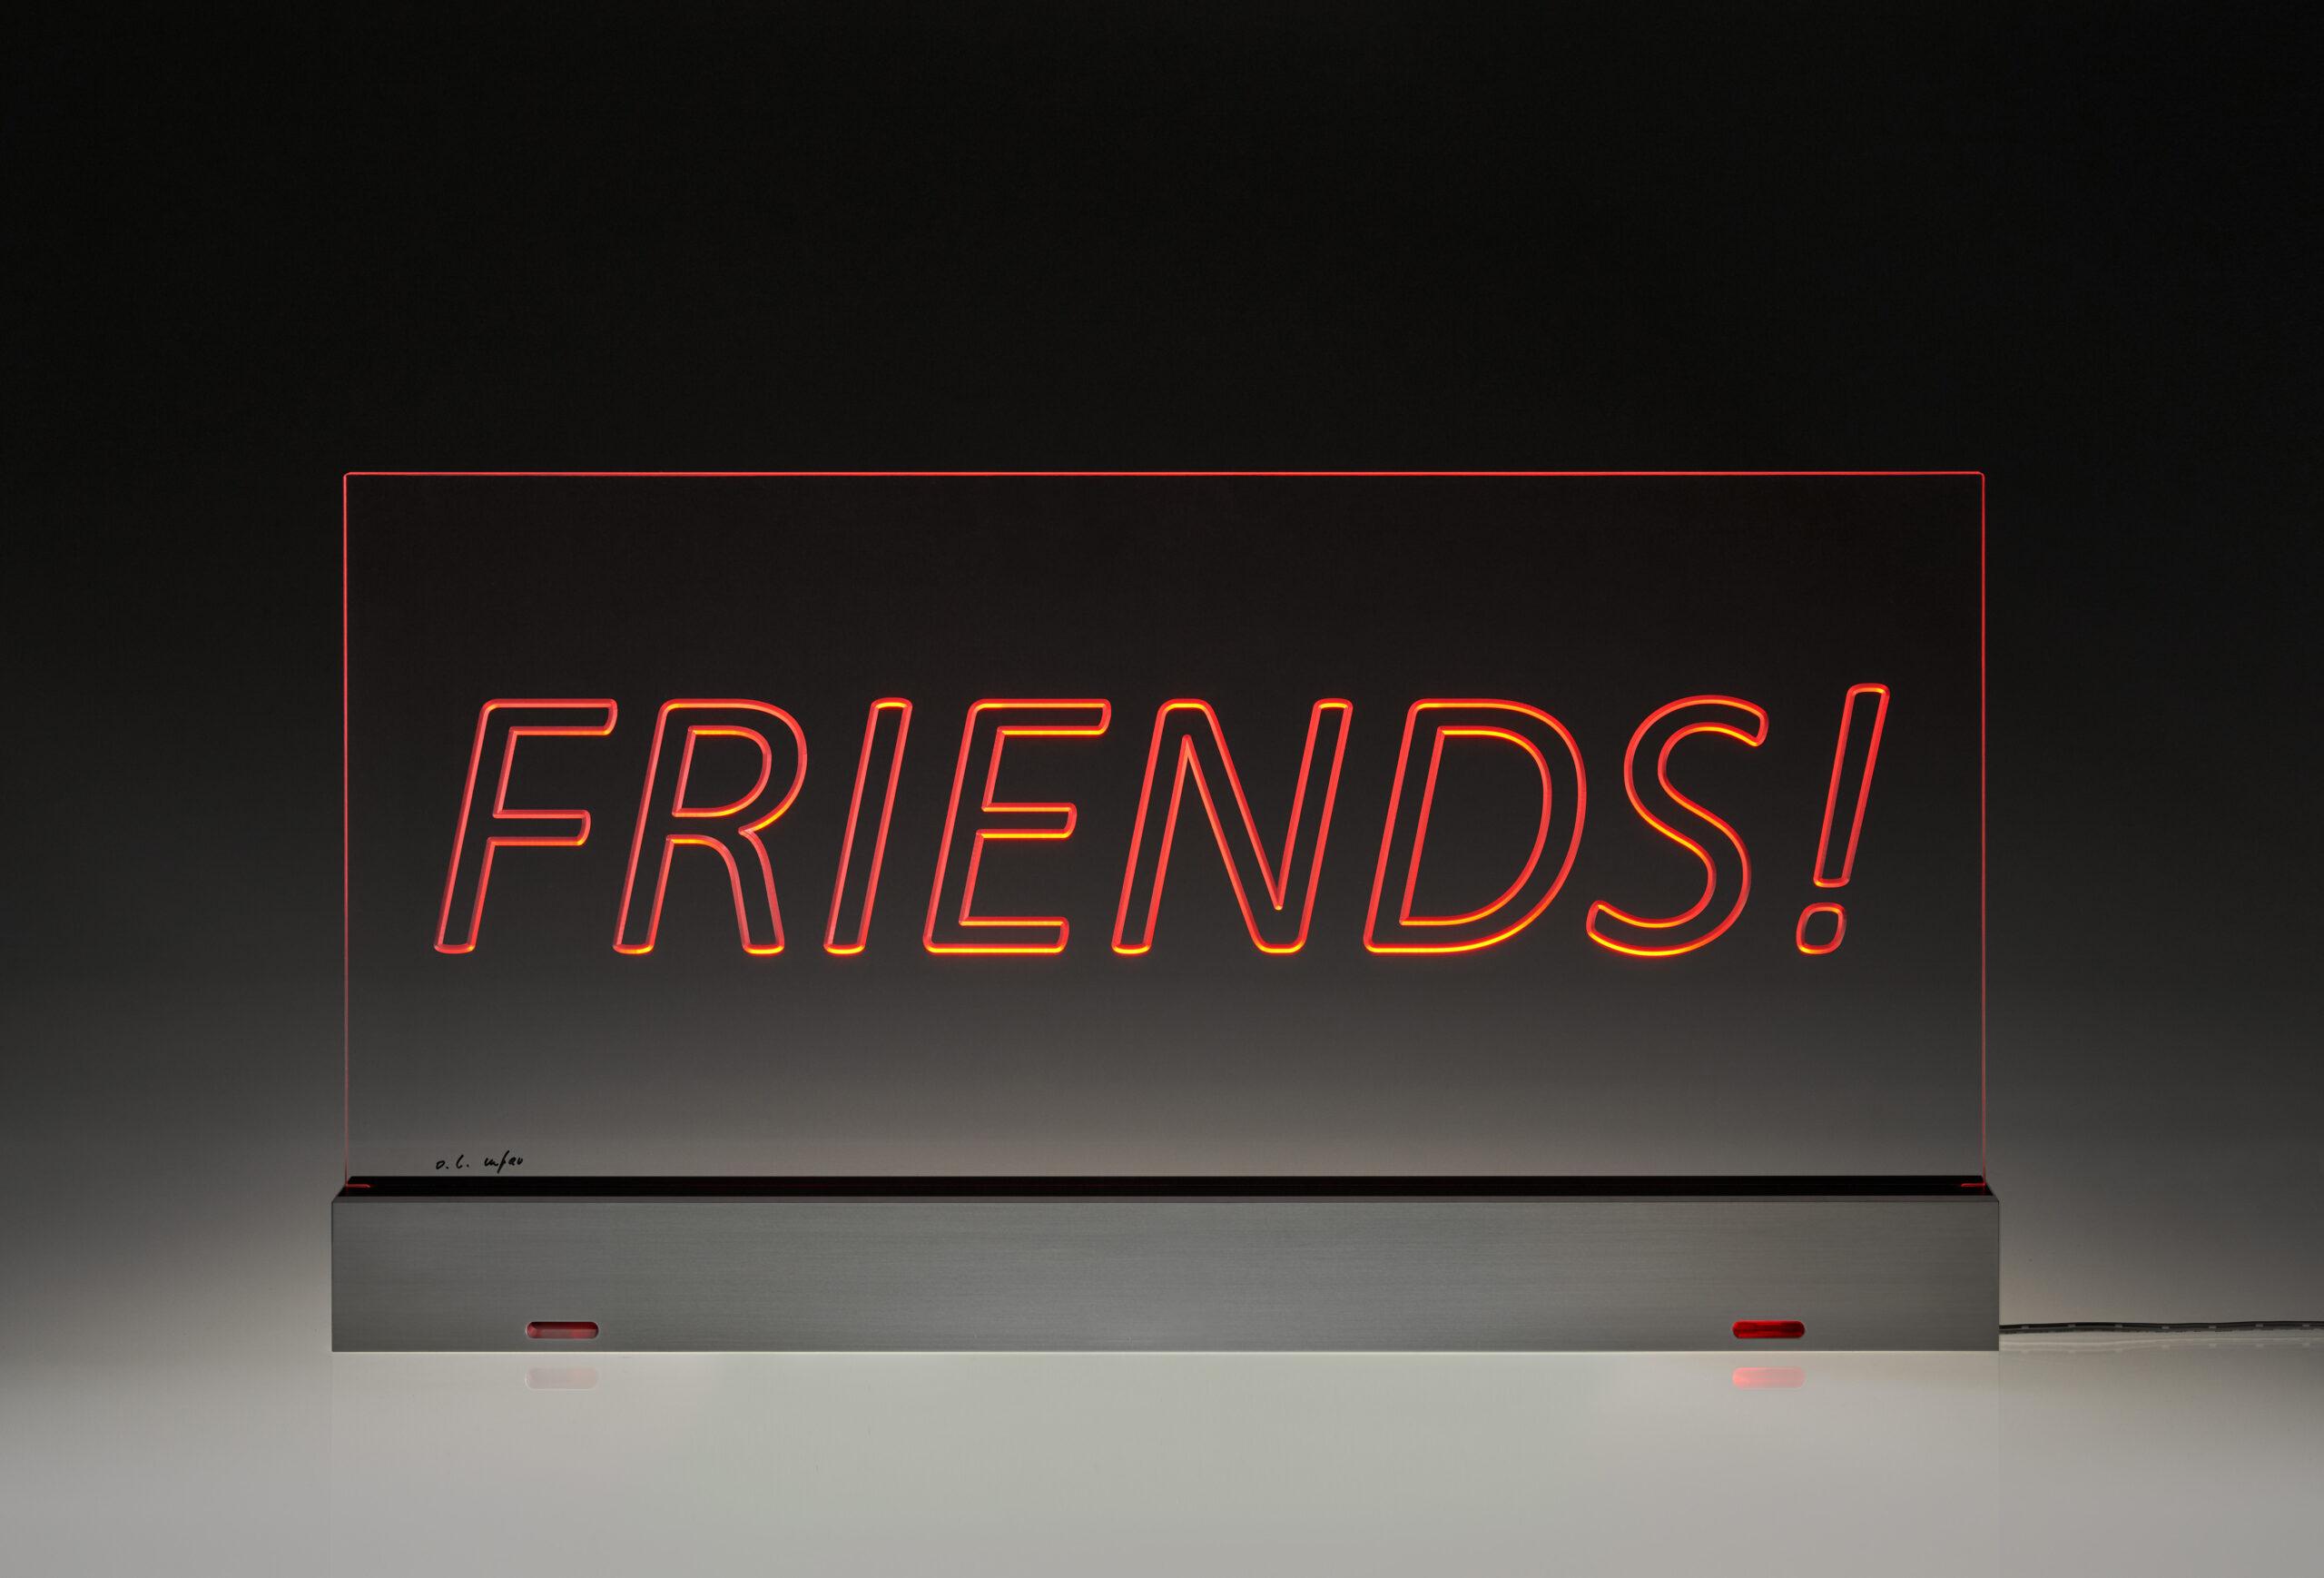 mfar_8076_FRIENDS_dunkel_red